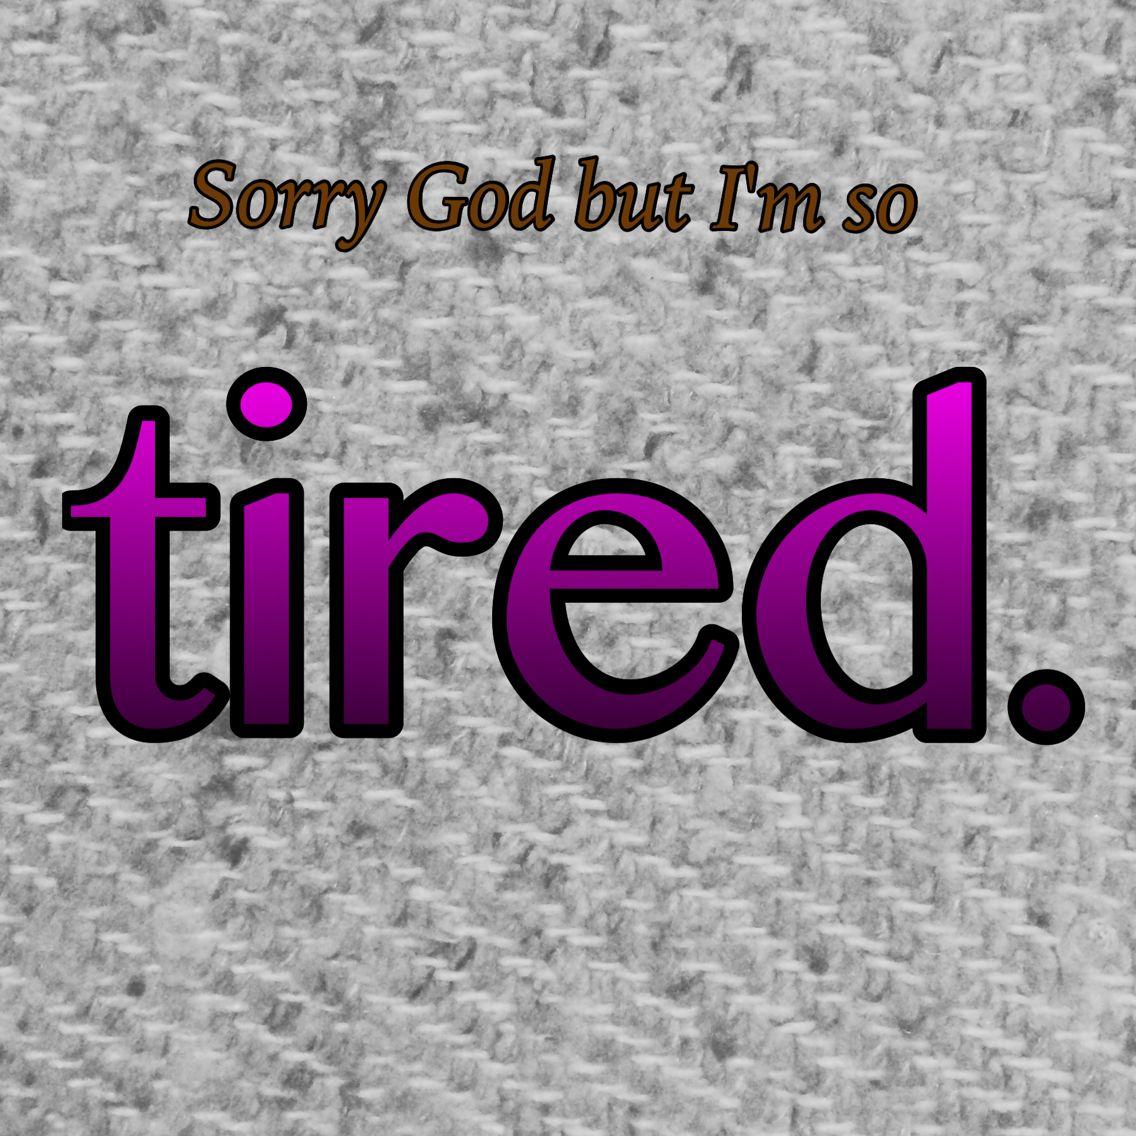 Maaf Tuhan Aku Lelah Tuhan Kutipan Pelajaran Hidup Kutipan Pelajaran